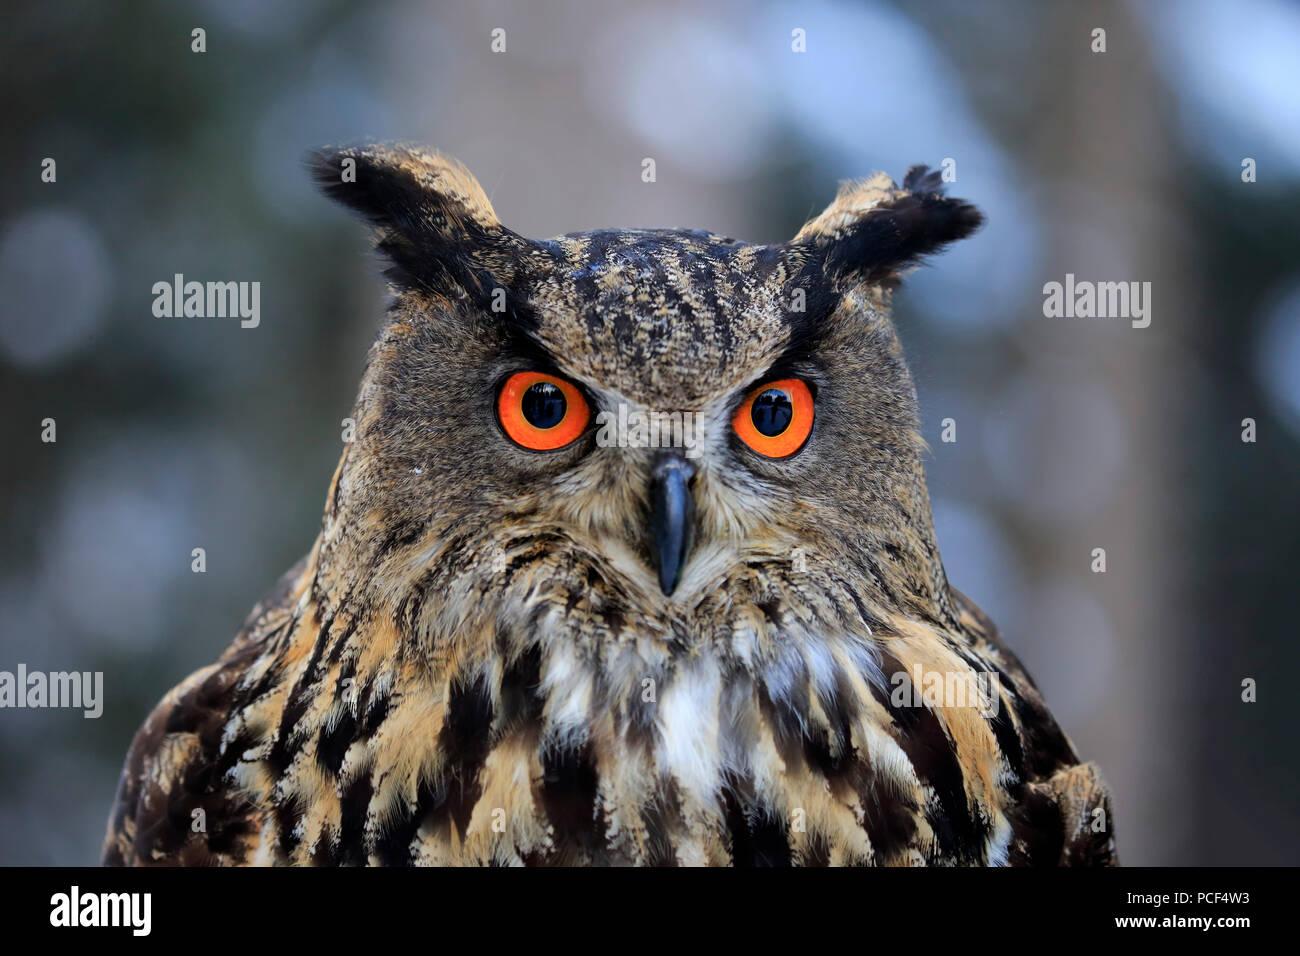 Eagle Owl, adult, Zdarske Vrchy, Bohemian-Moravian Highlands, Czech Republic, (Bubo bubo) - Stock Image